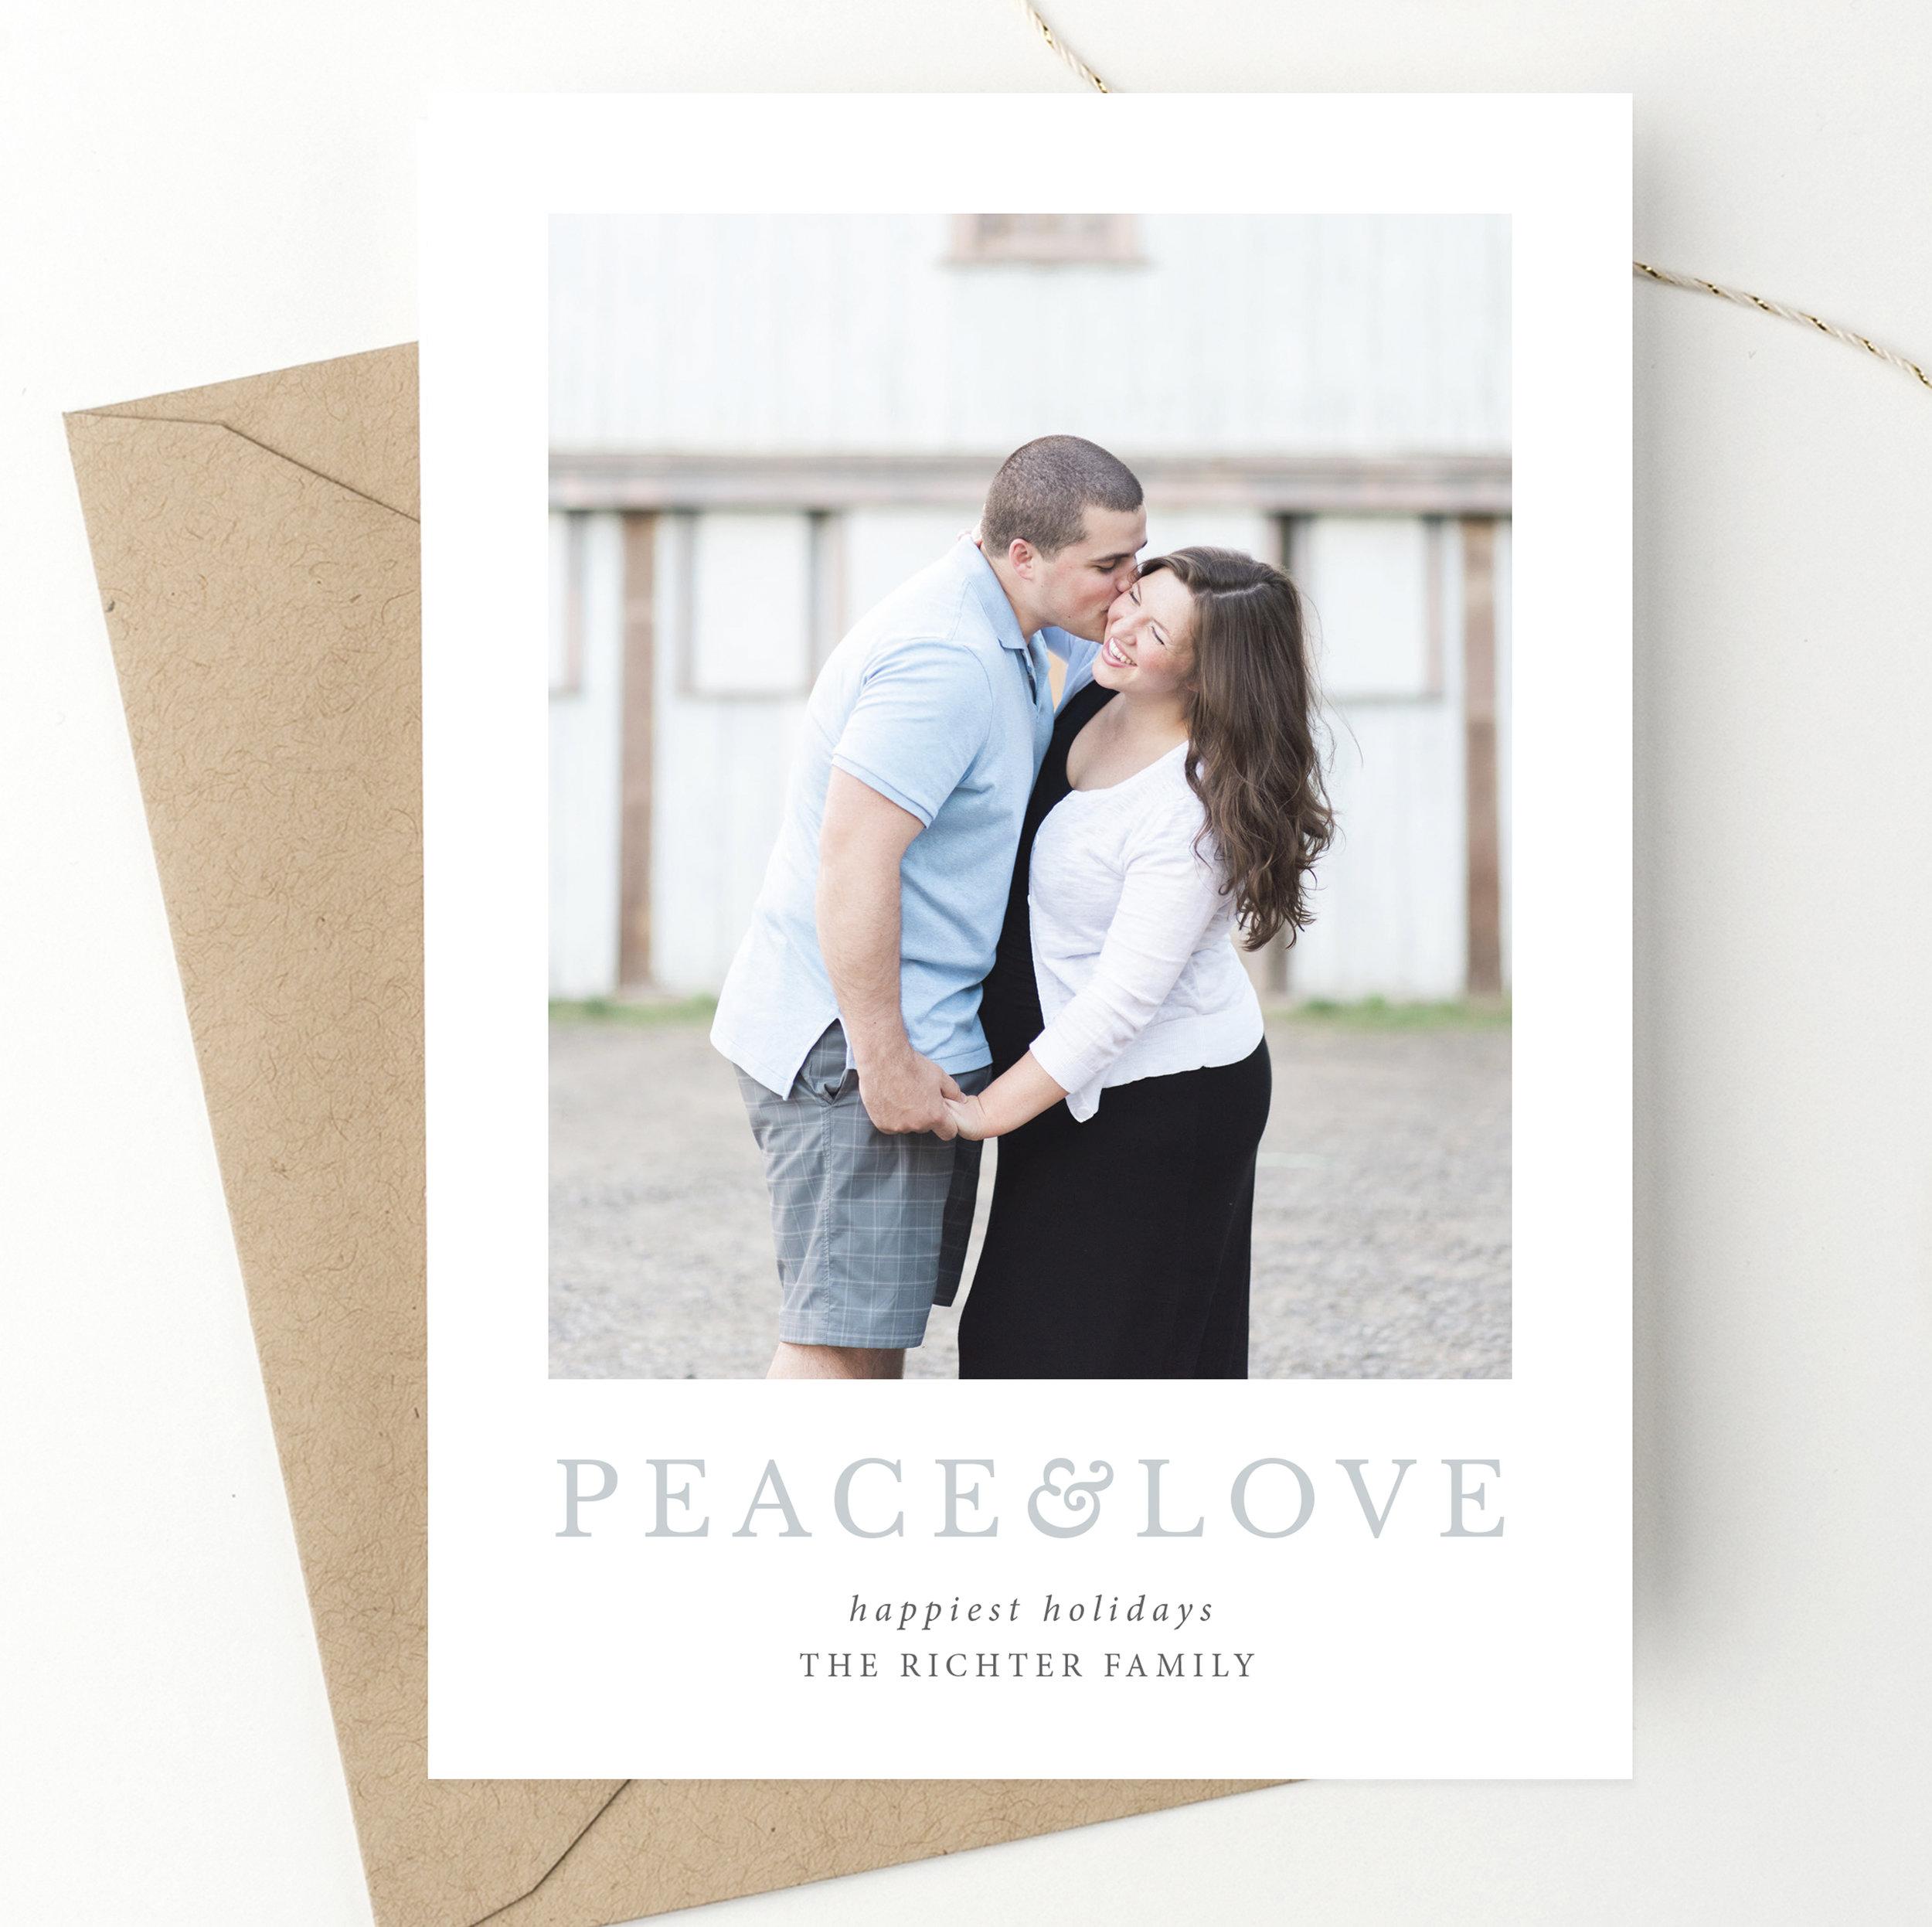 peace&love.jpg